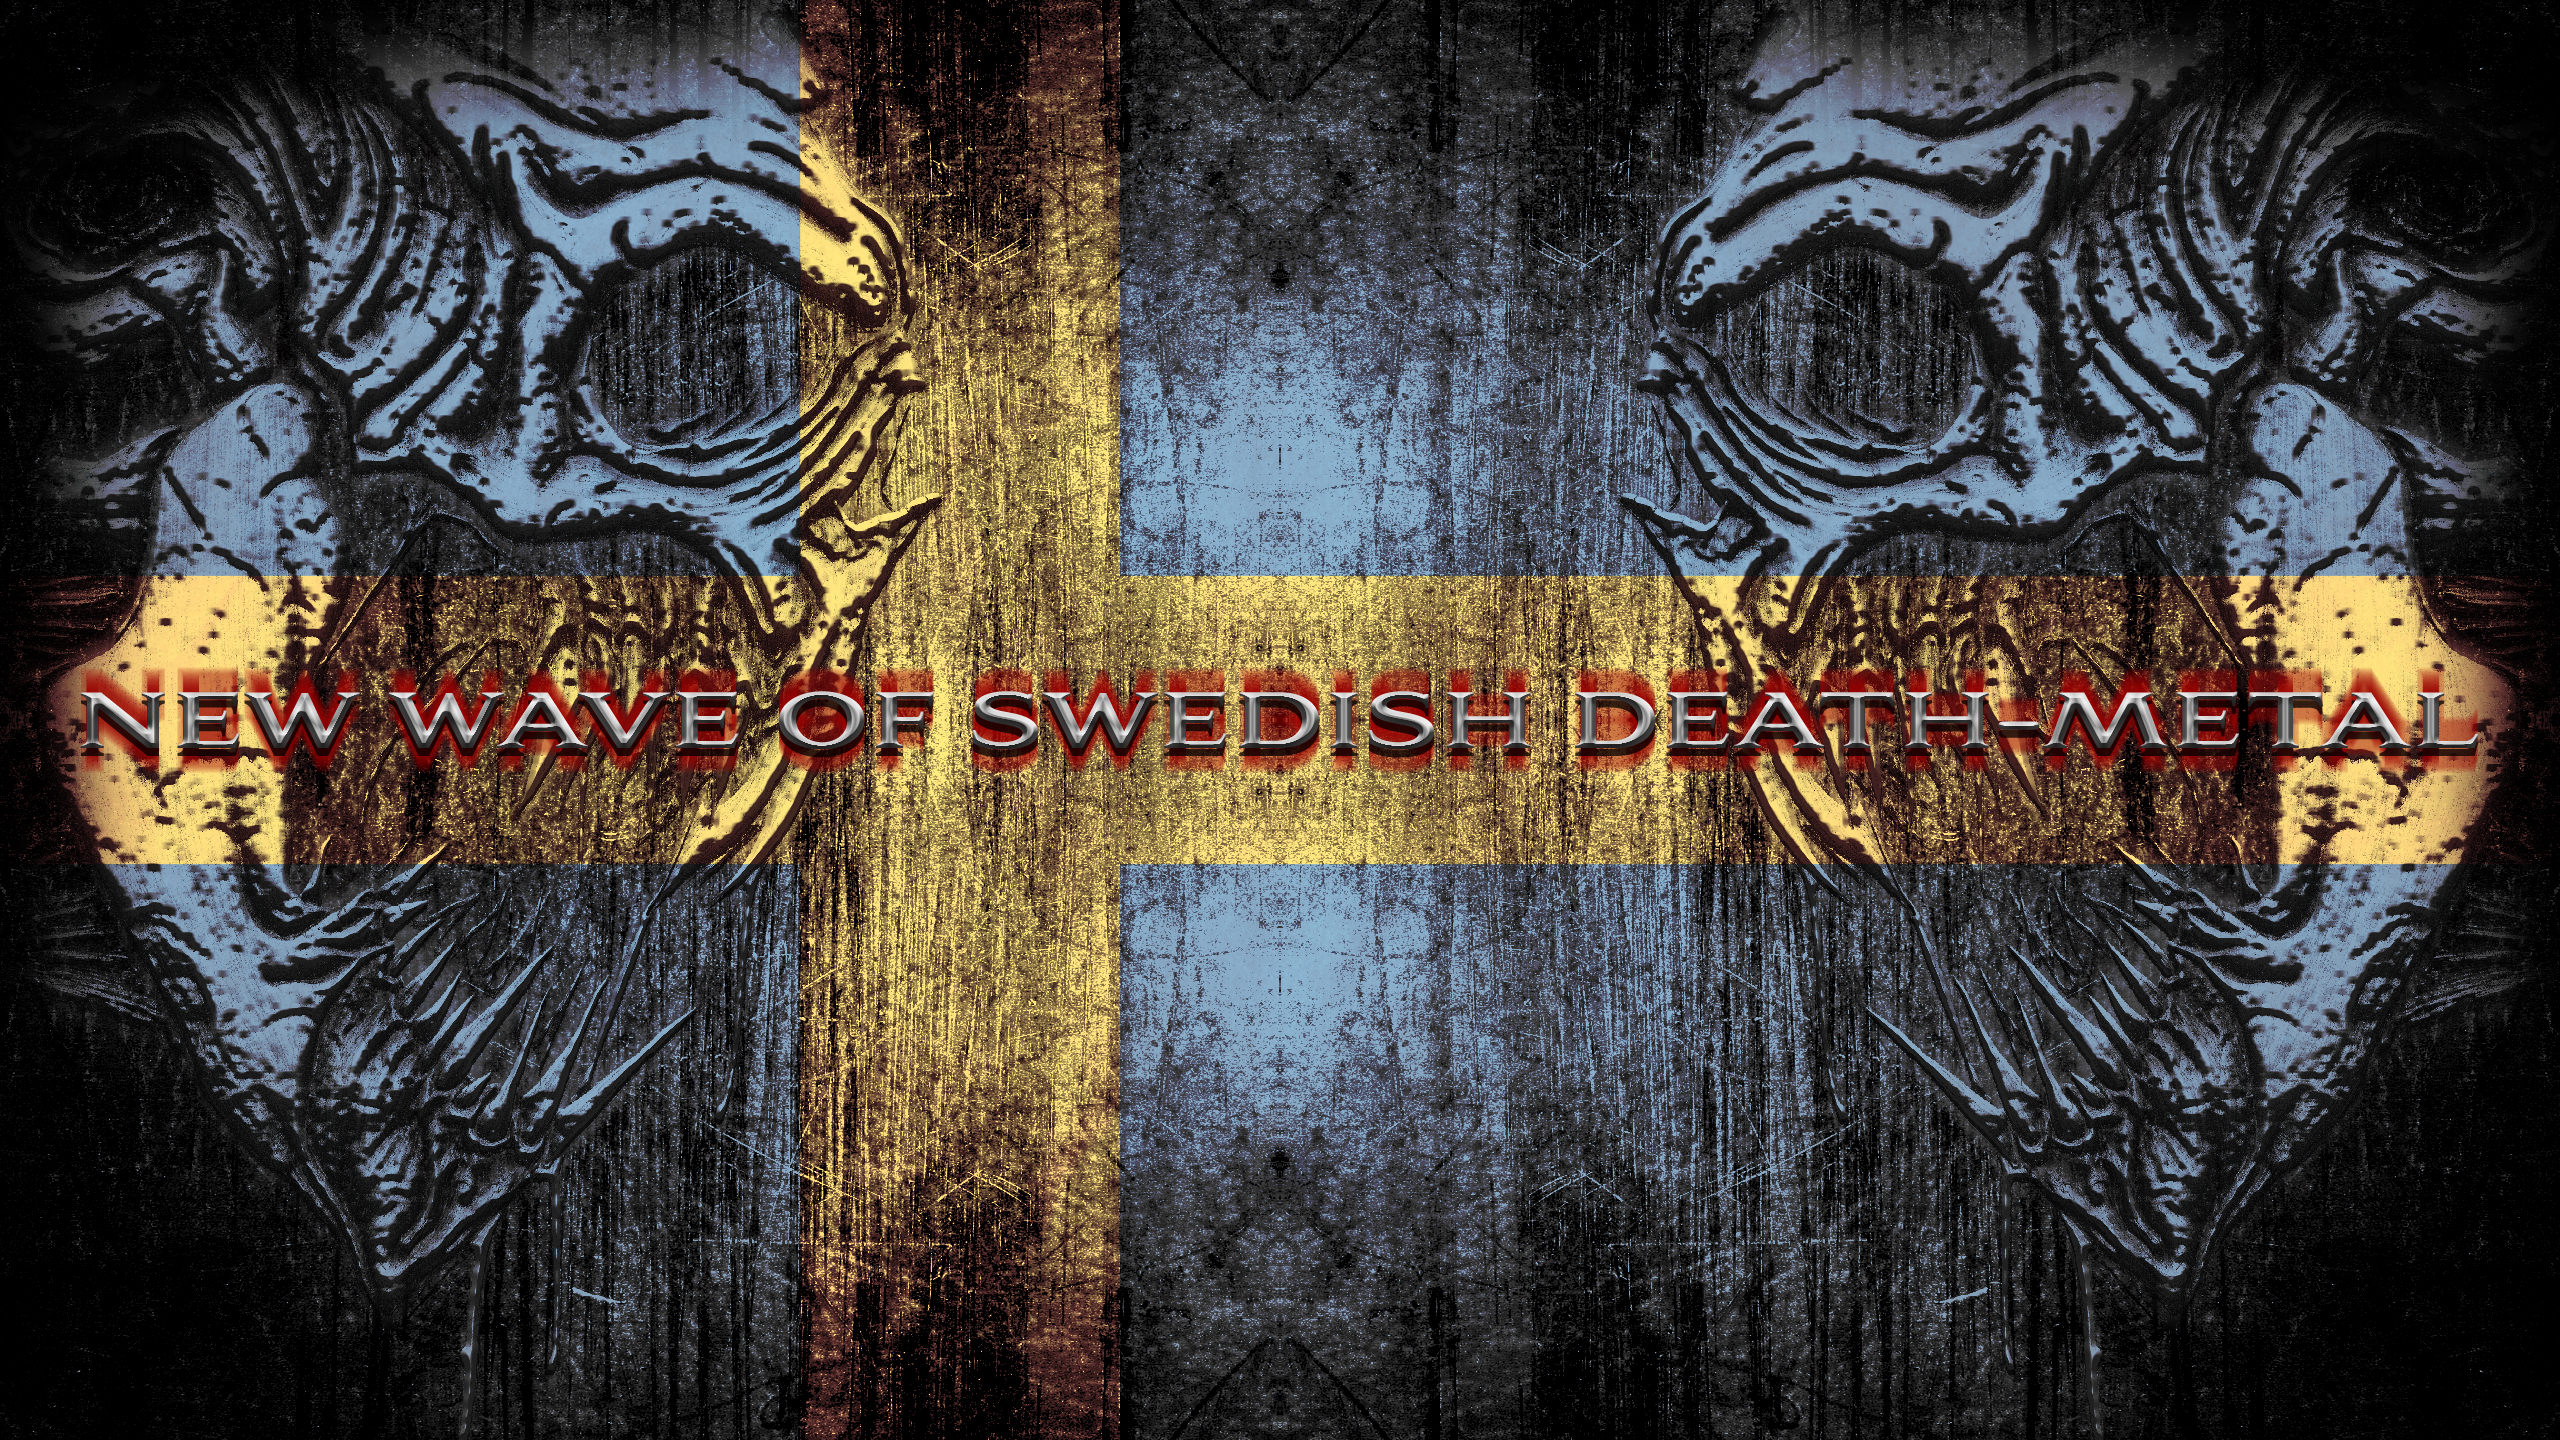 New wave of swedish death metal by disturbedkorea on - Death metal wallpaper ...